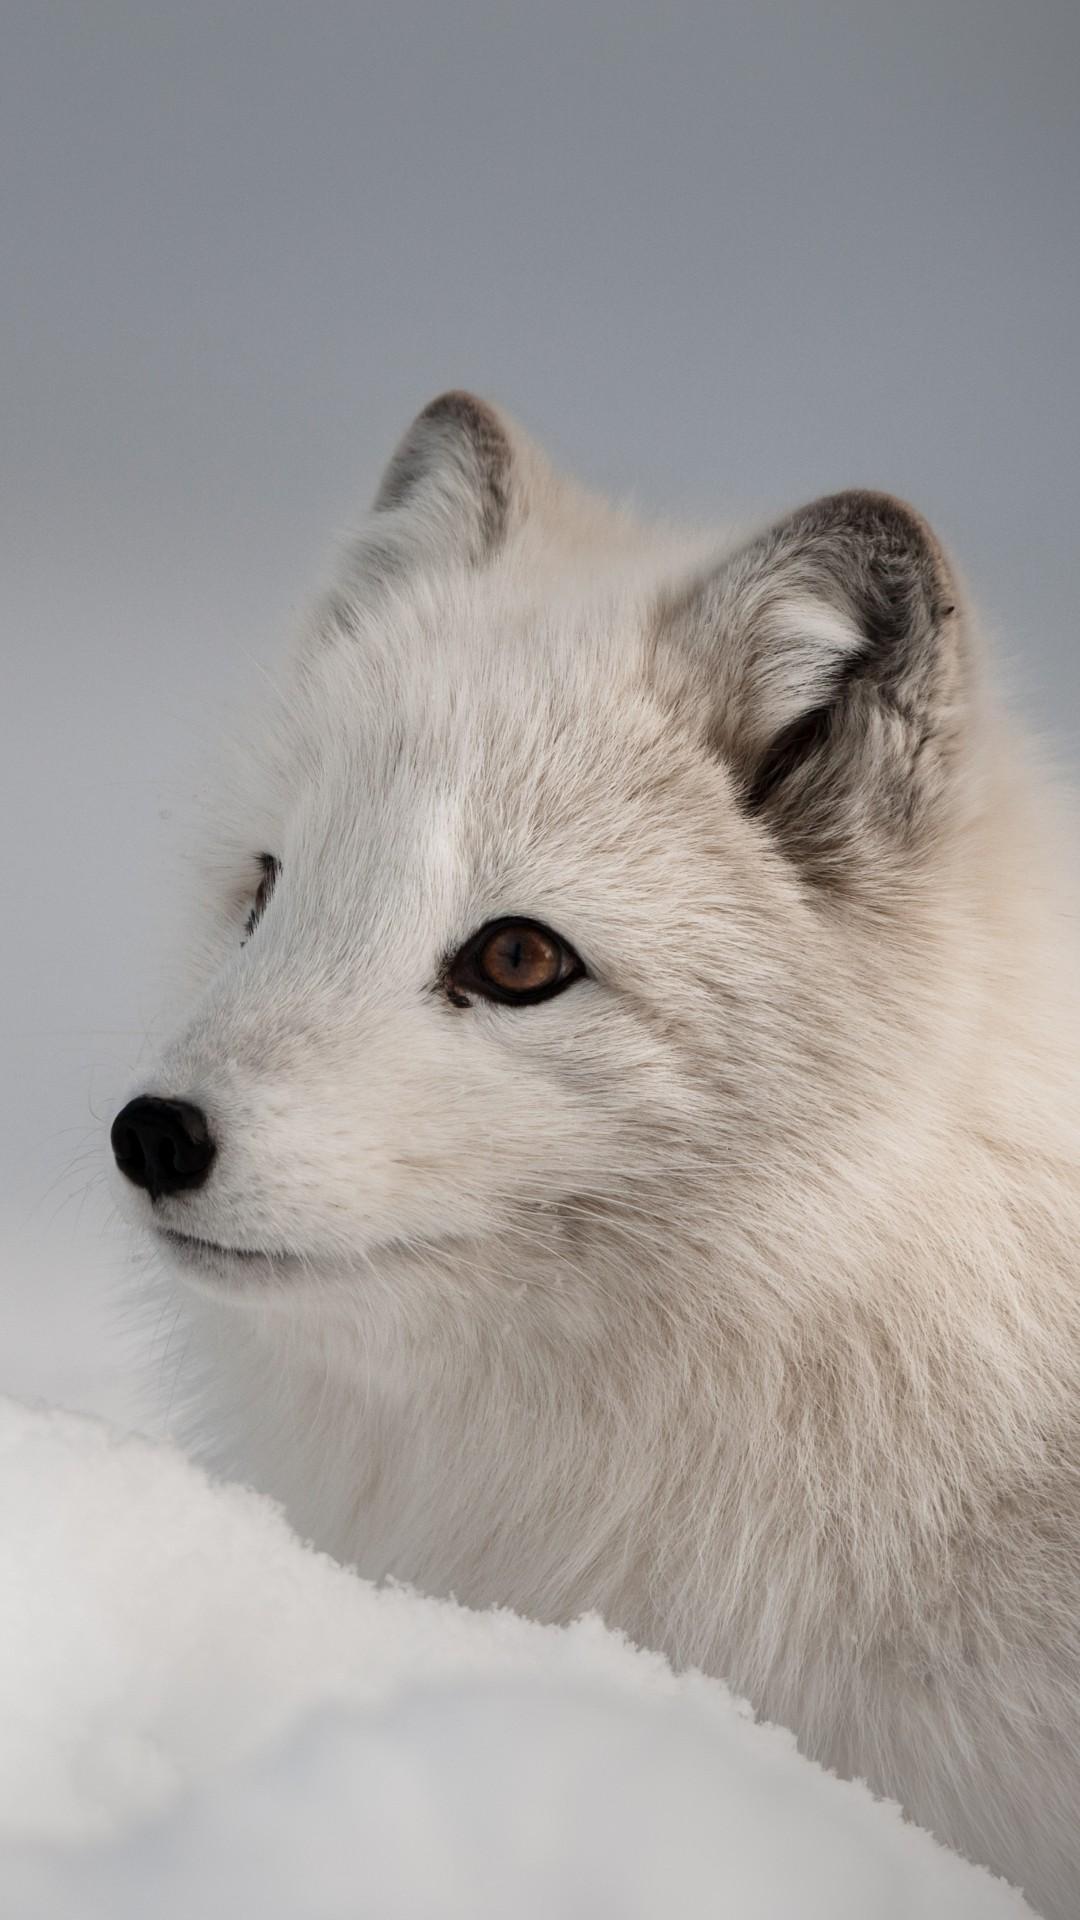 Cute Grey Wallpaper Wallpaper Arctic Fox Northern Hemisphere Animal Animals